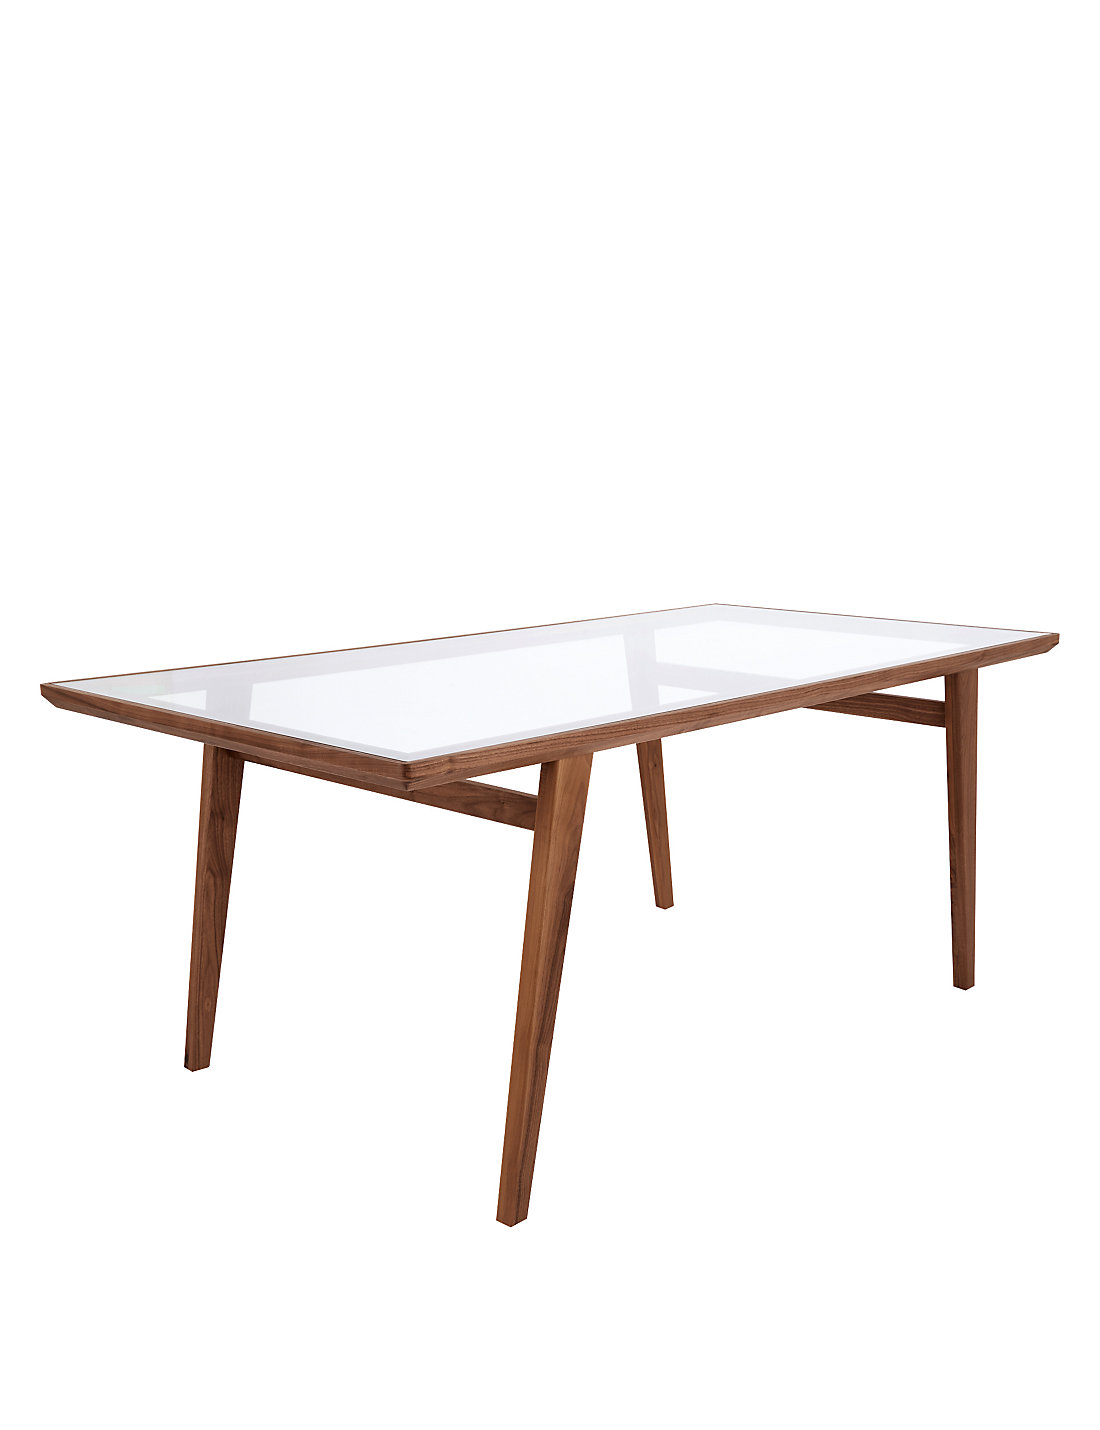 Conran Ashworth Dining Table. Conran Ashworth Dining Table   M S